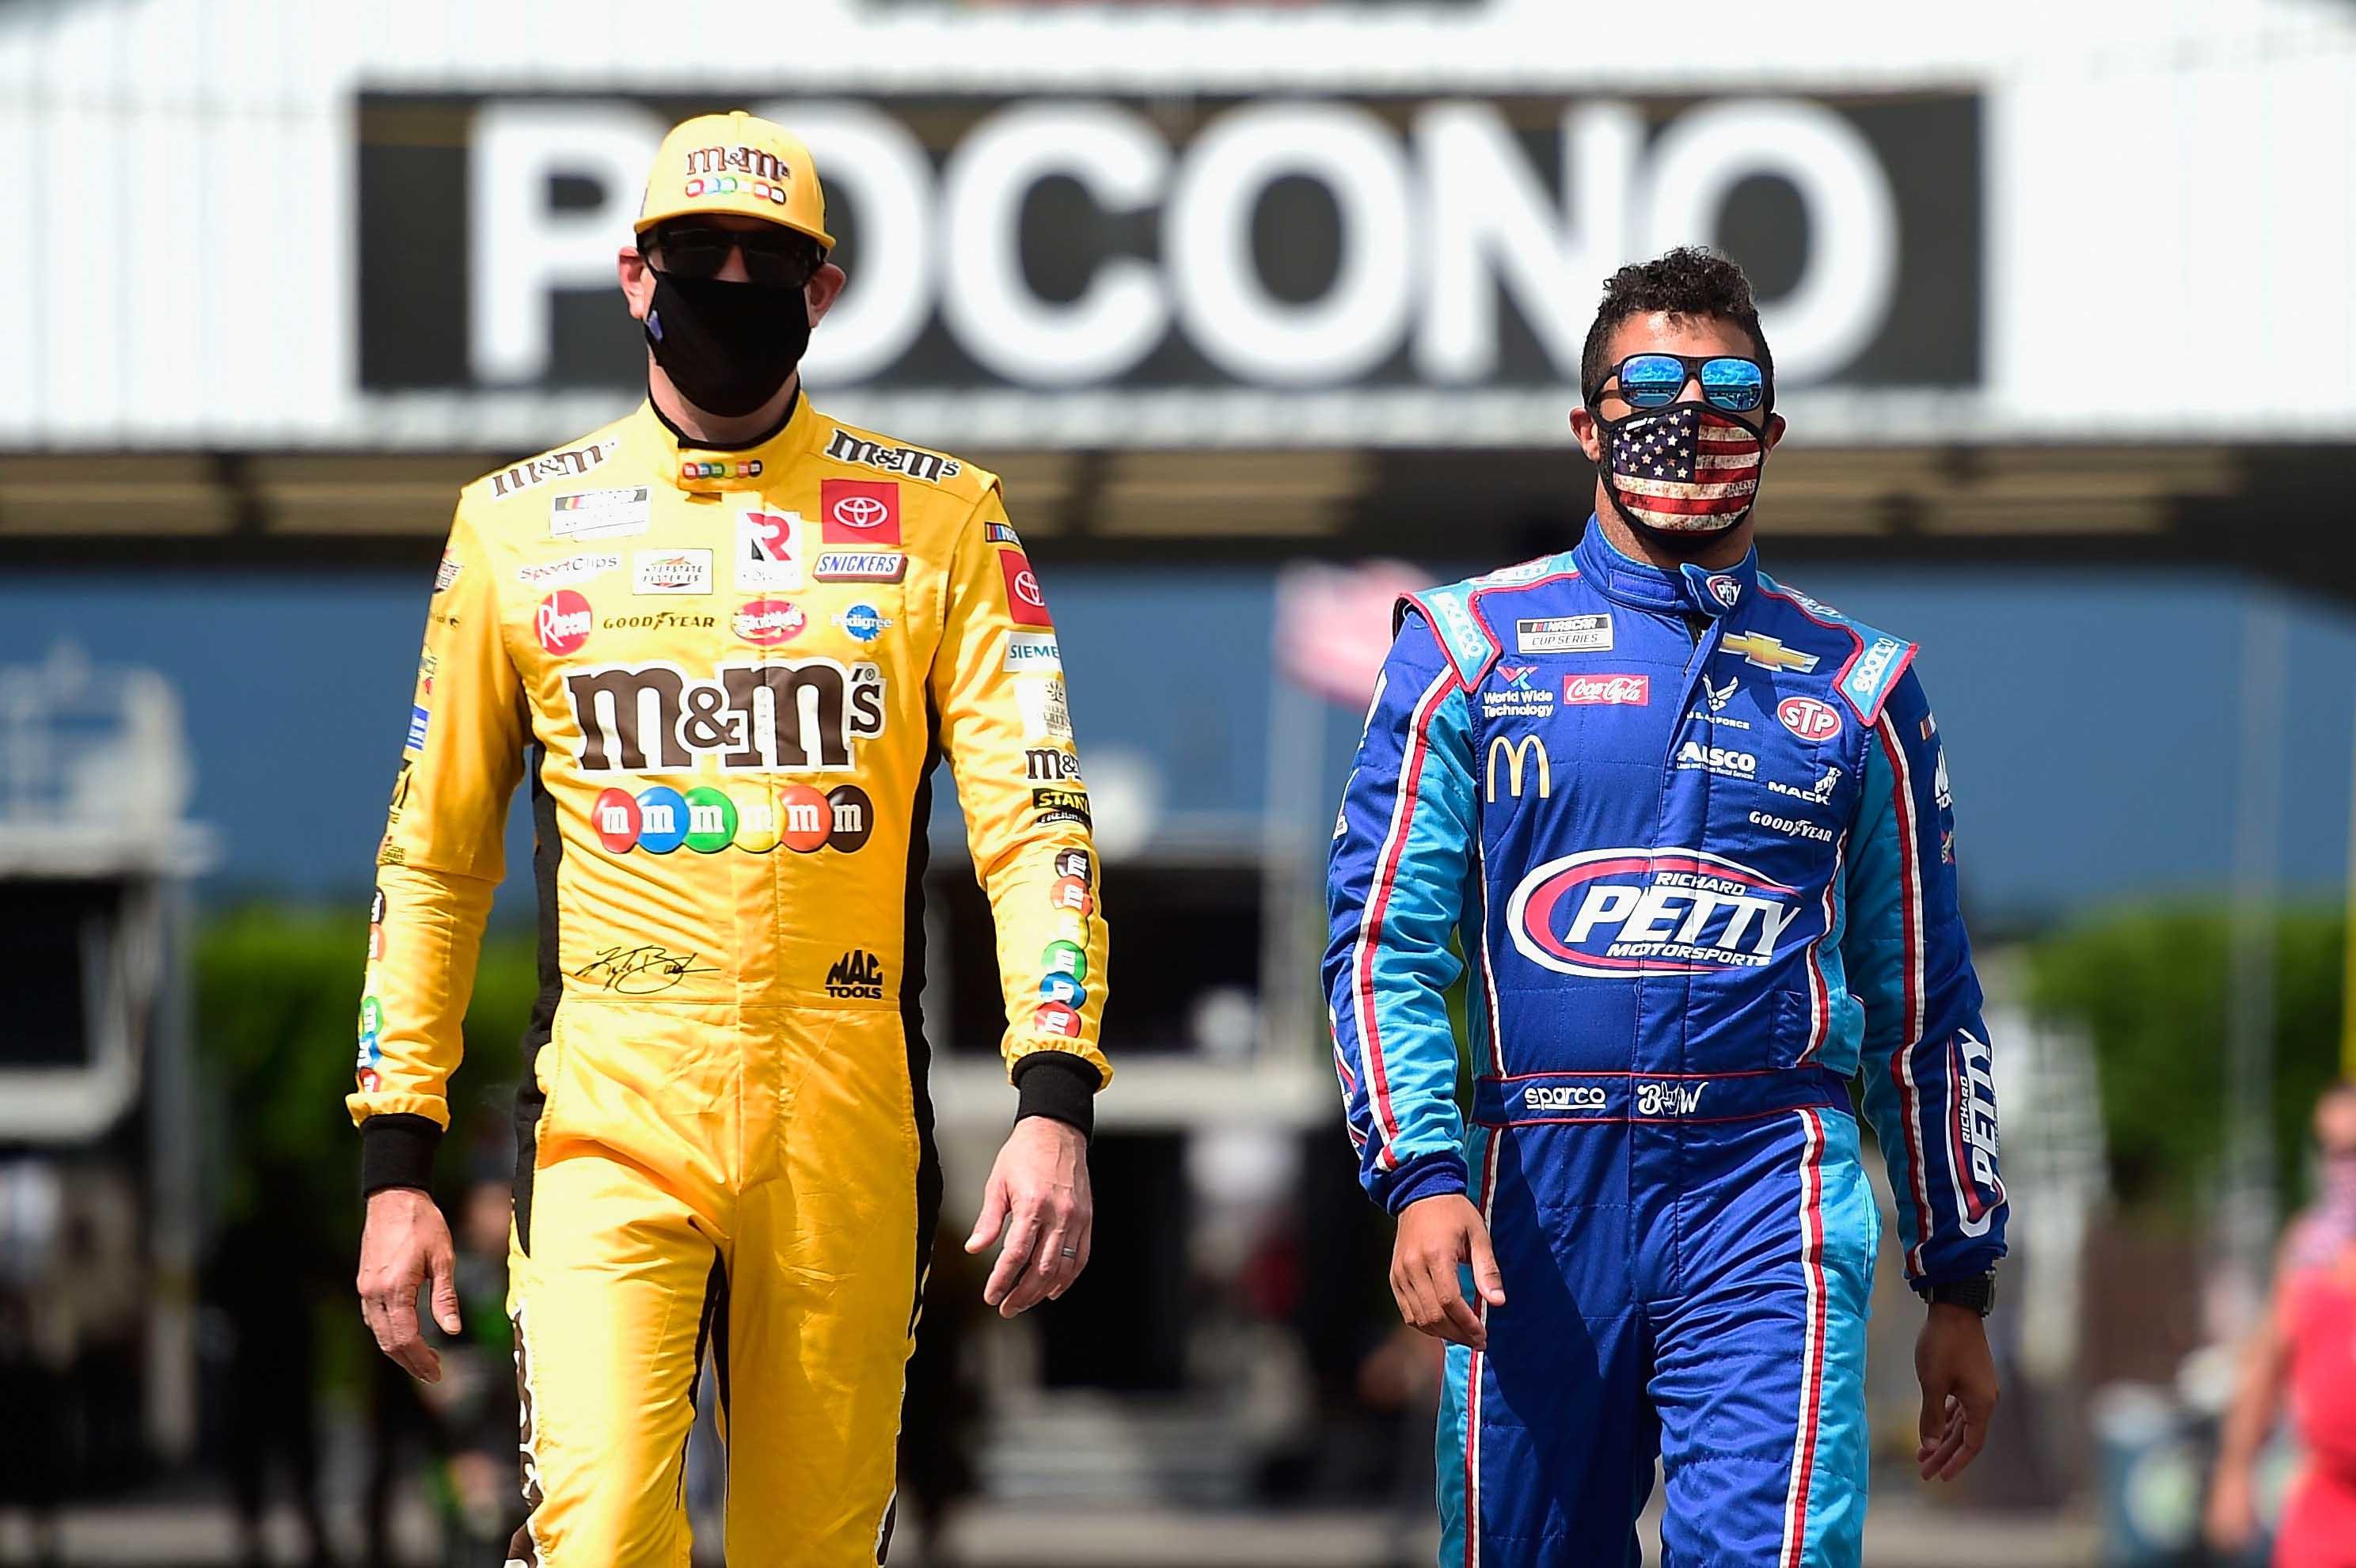 Kyle Busch and Bubba Wallace at Pocono Raceway - NASCAR drivers